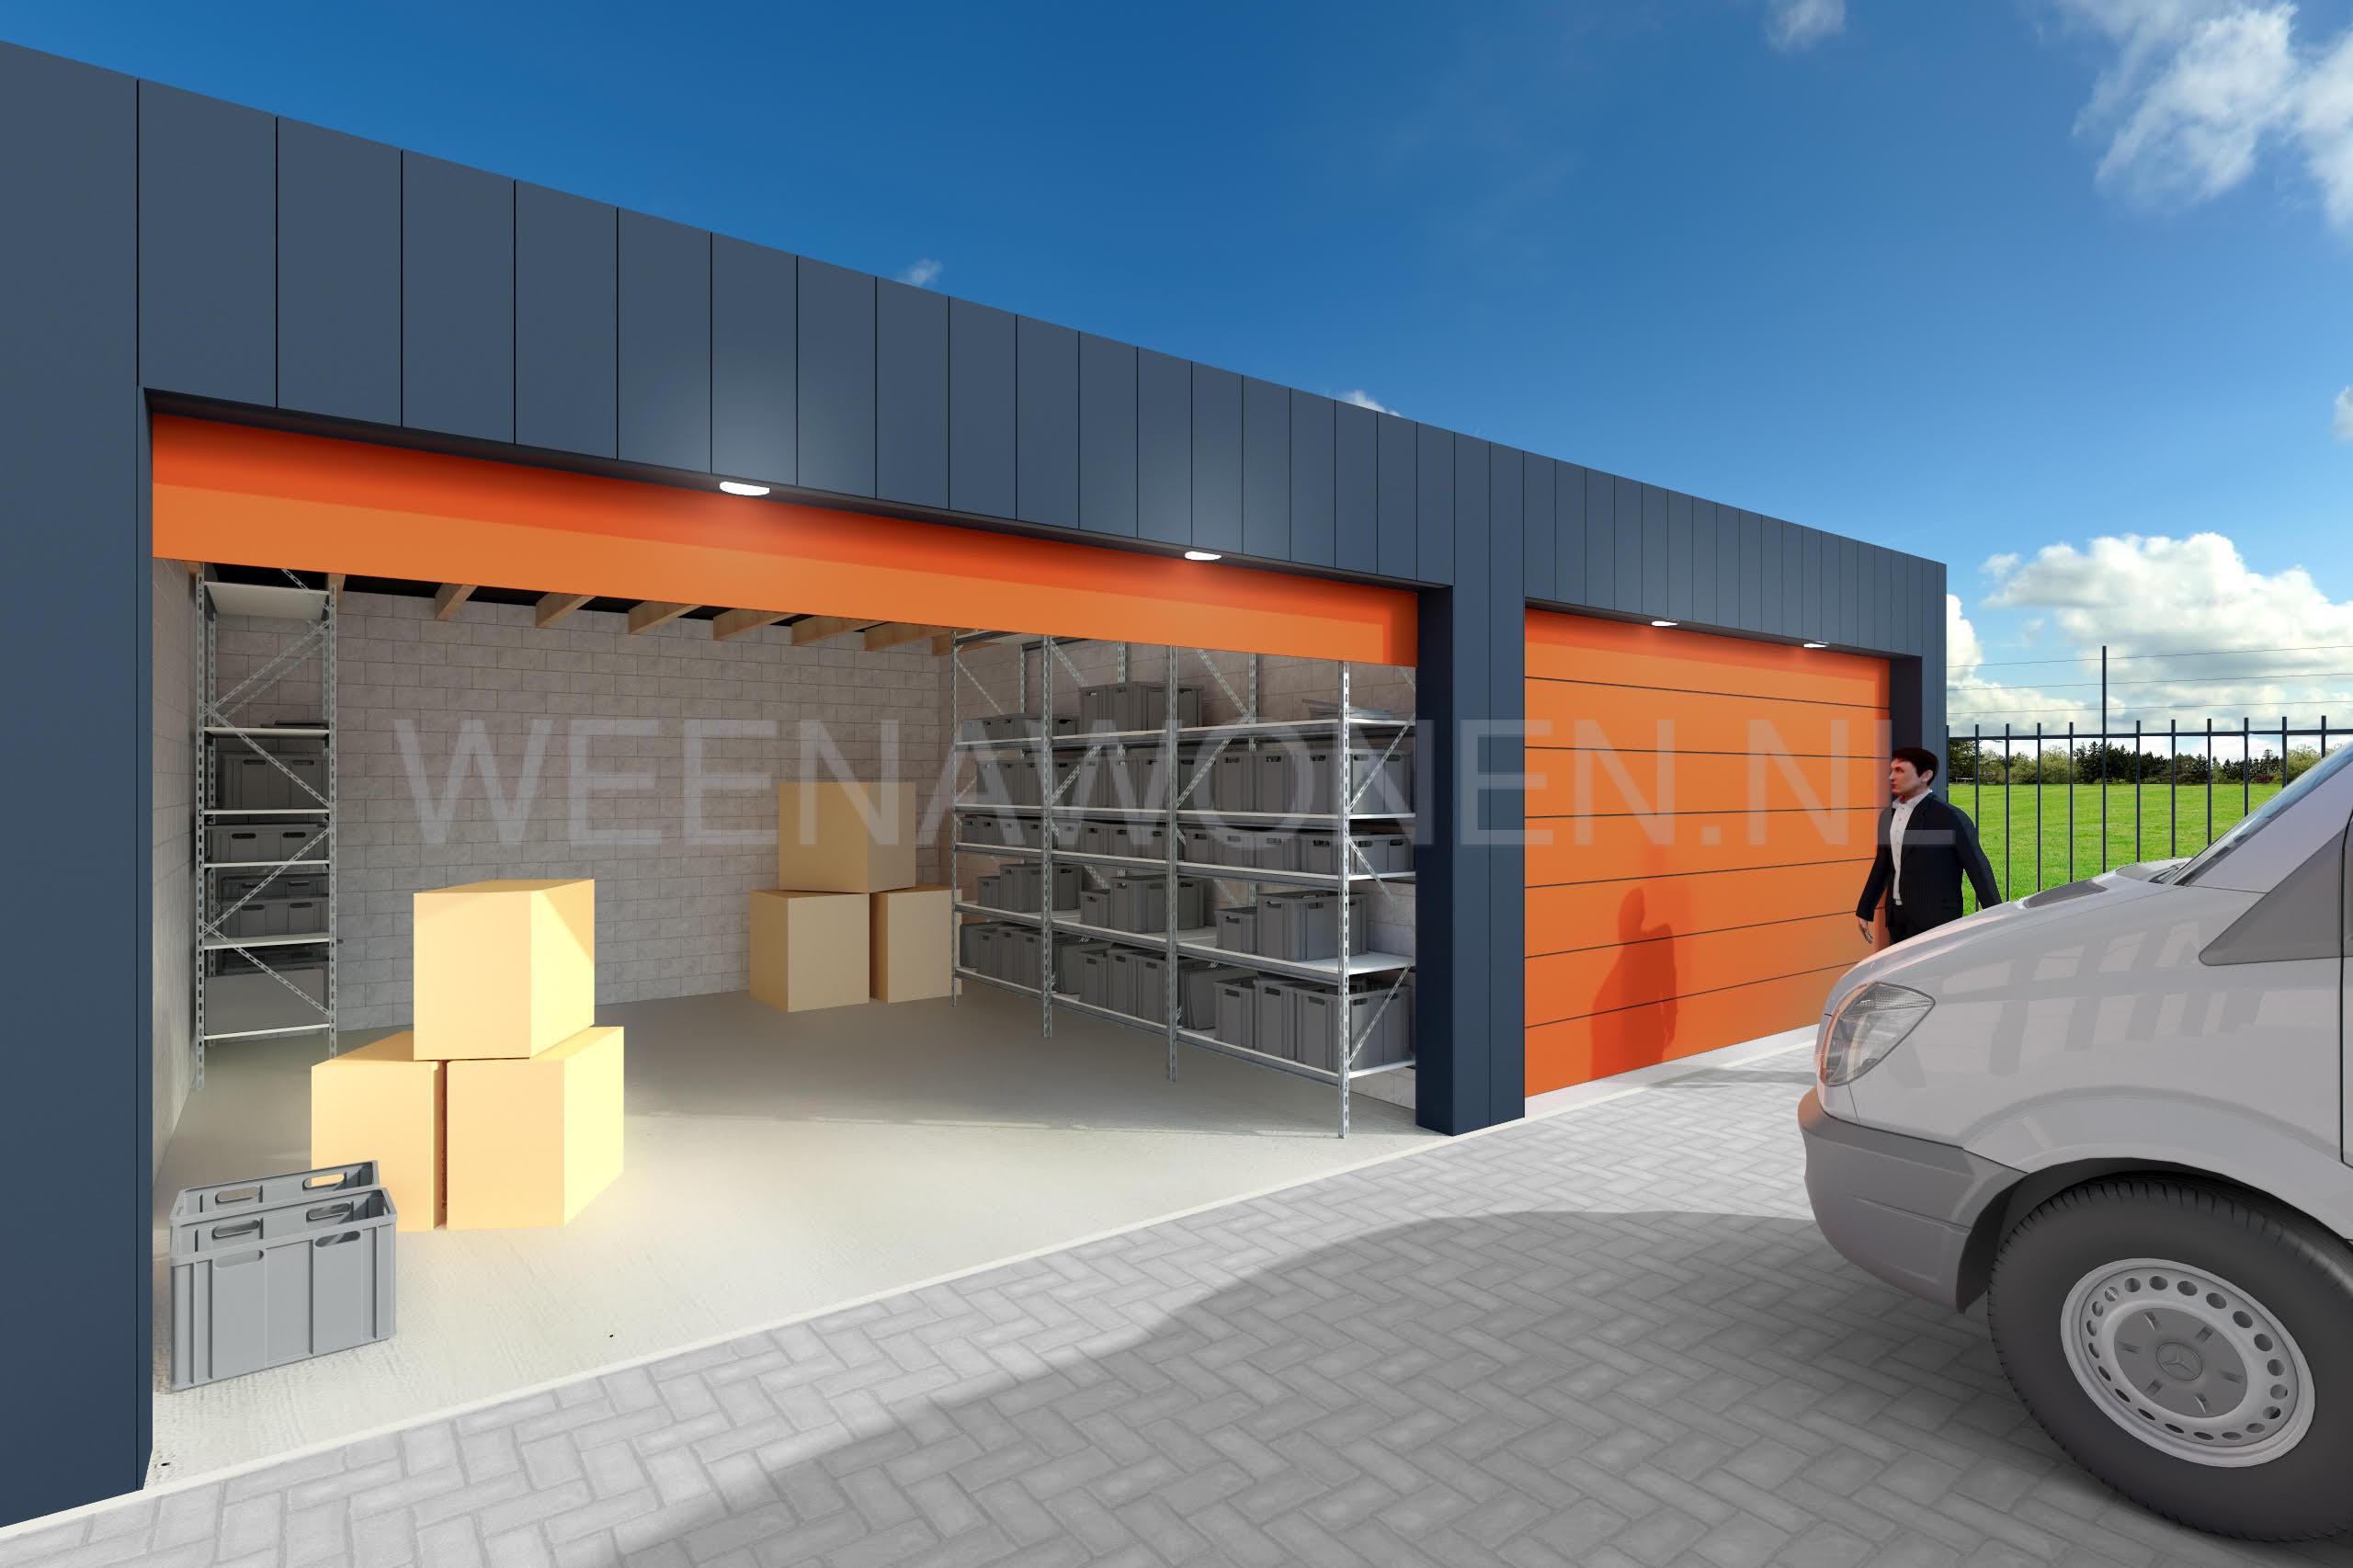 Te huur garageboxen in Terbregge te Rotterdam (Hillegersberg).